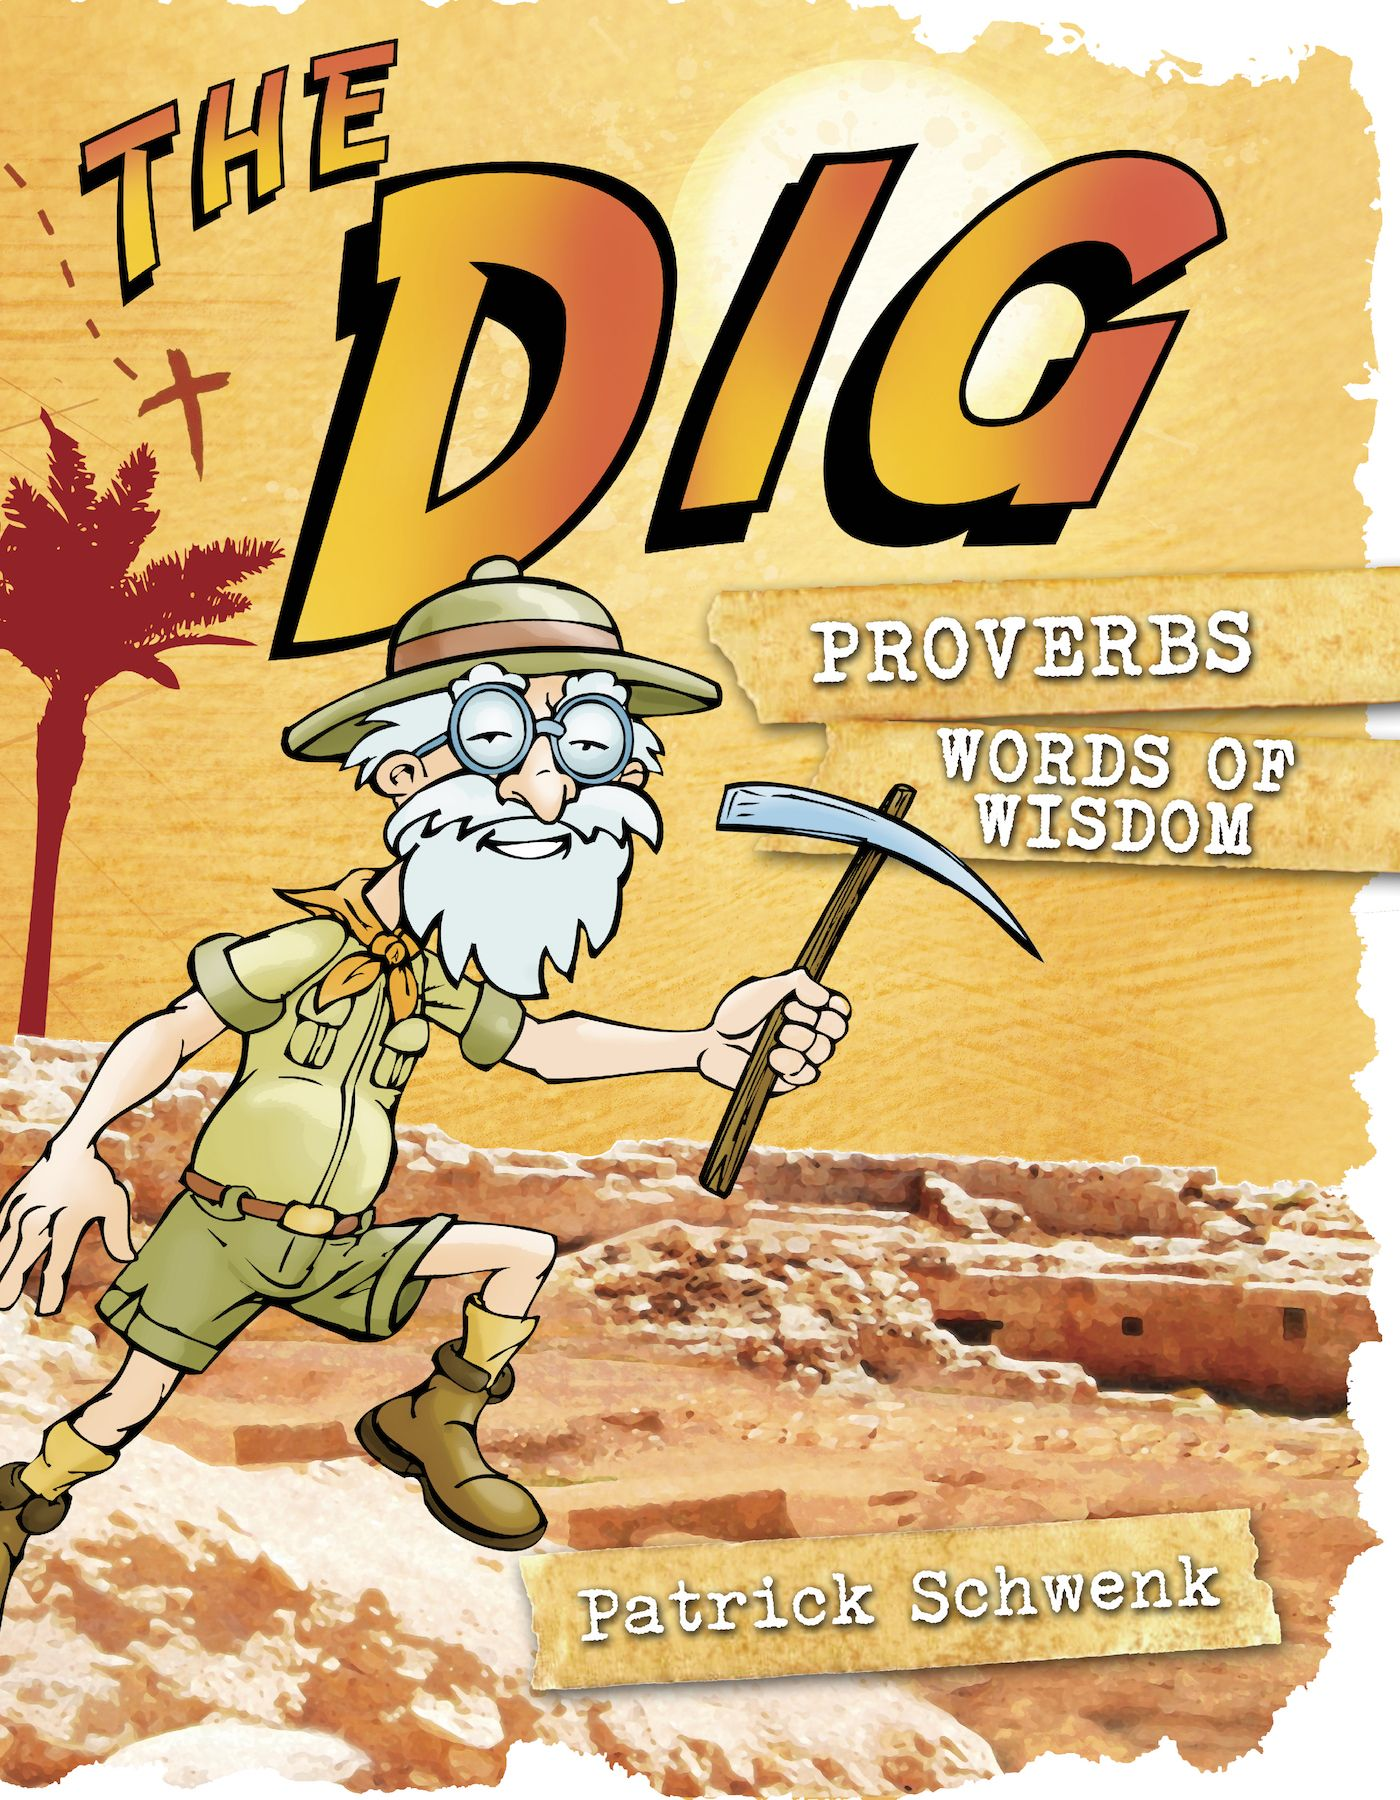 Proverbs 1 - NIV Bible - Bible Study Tools